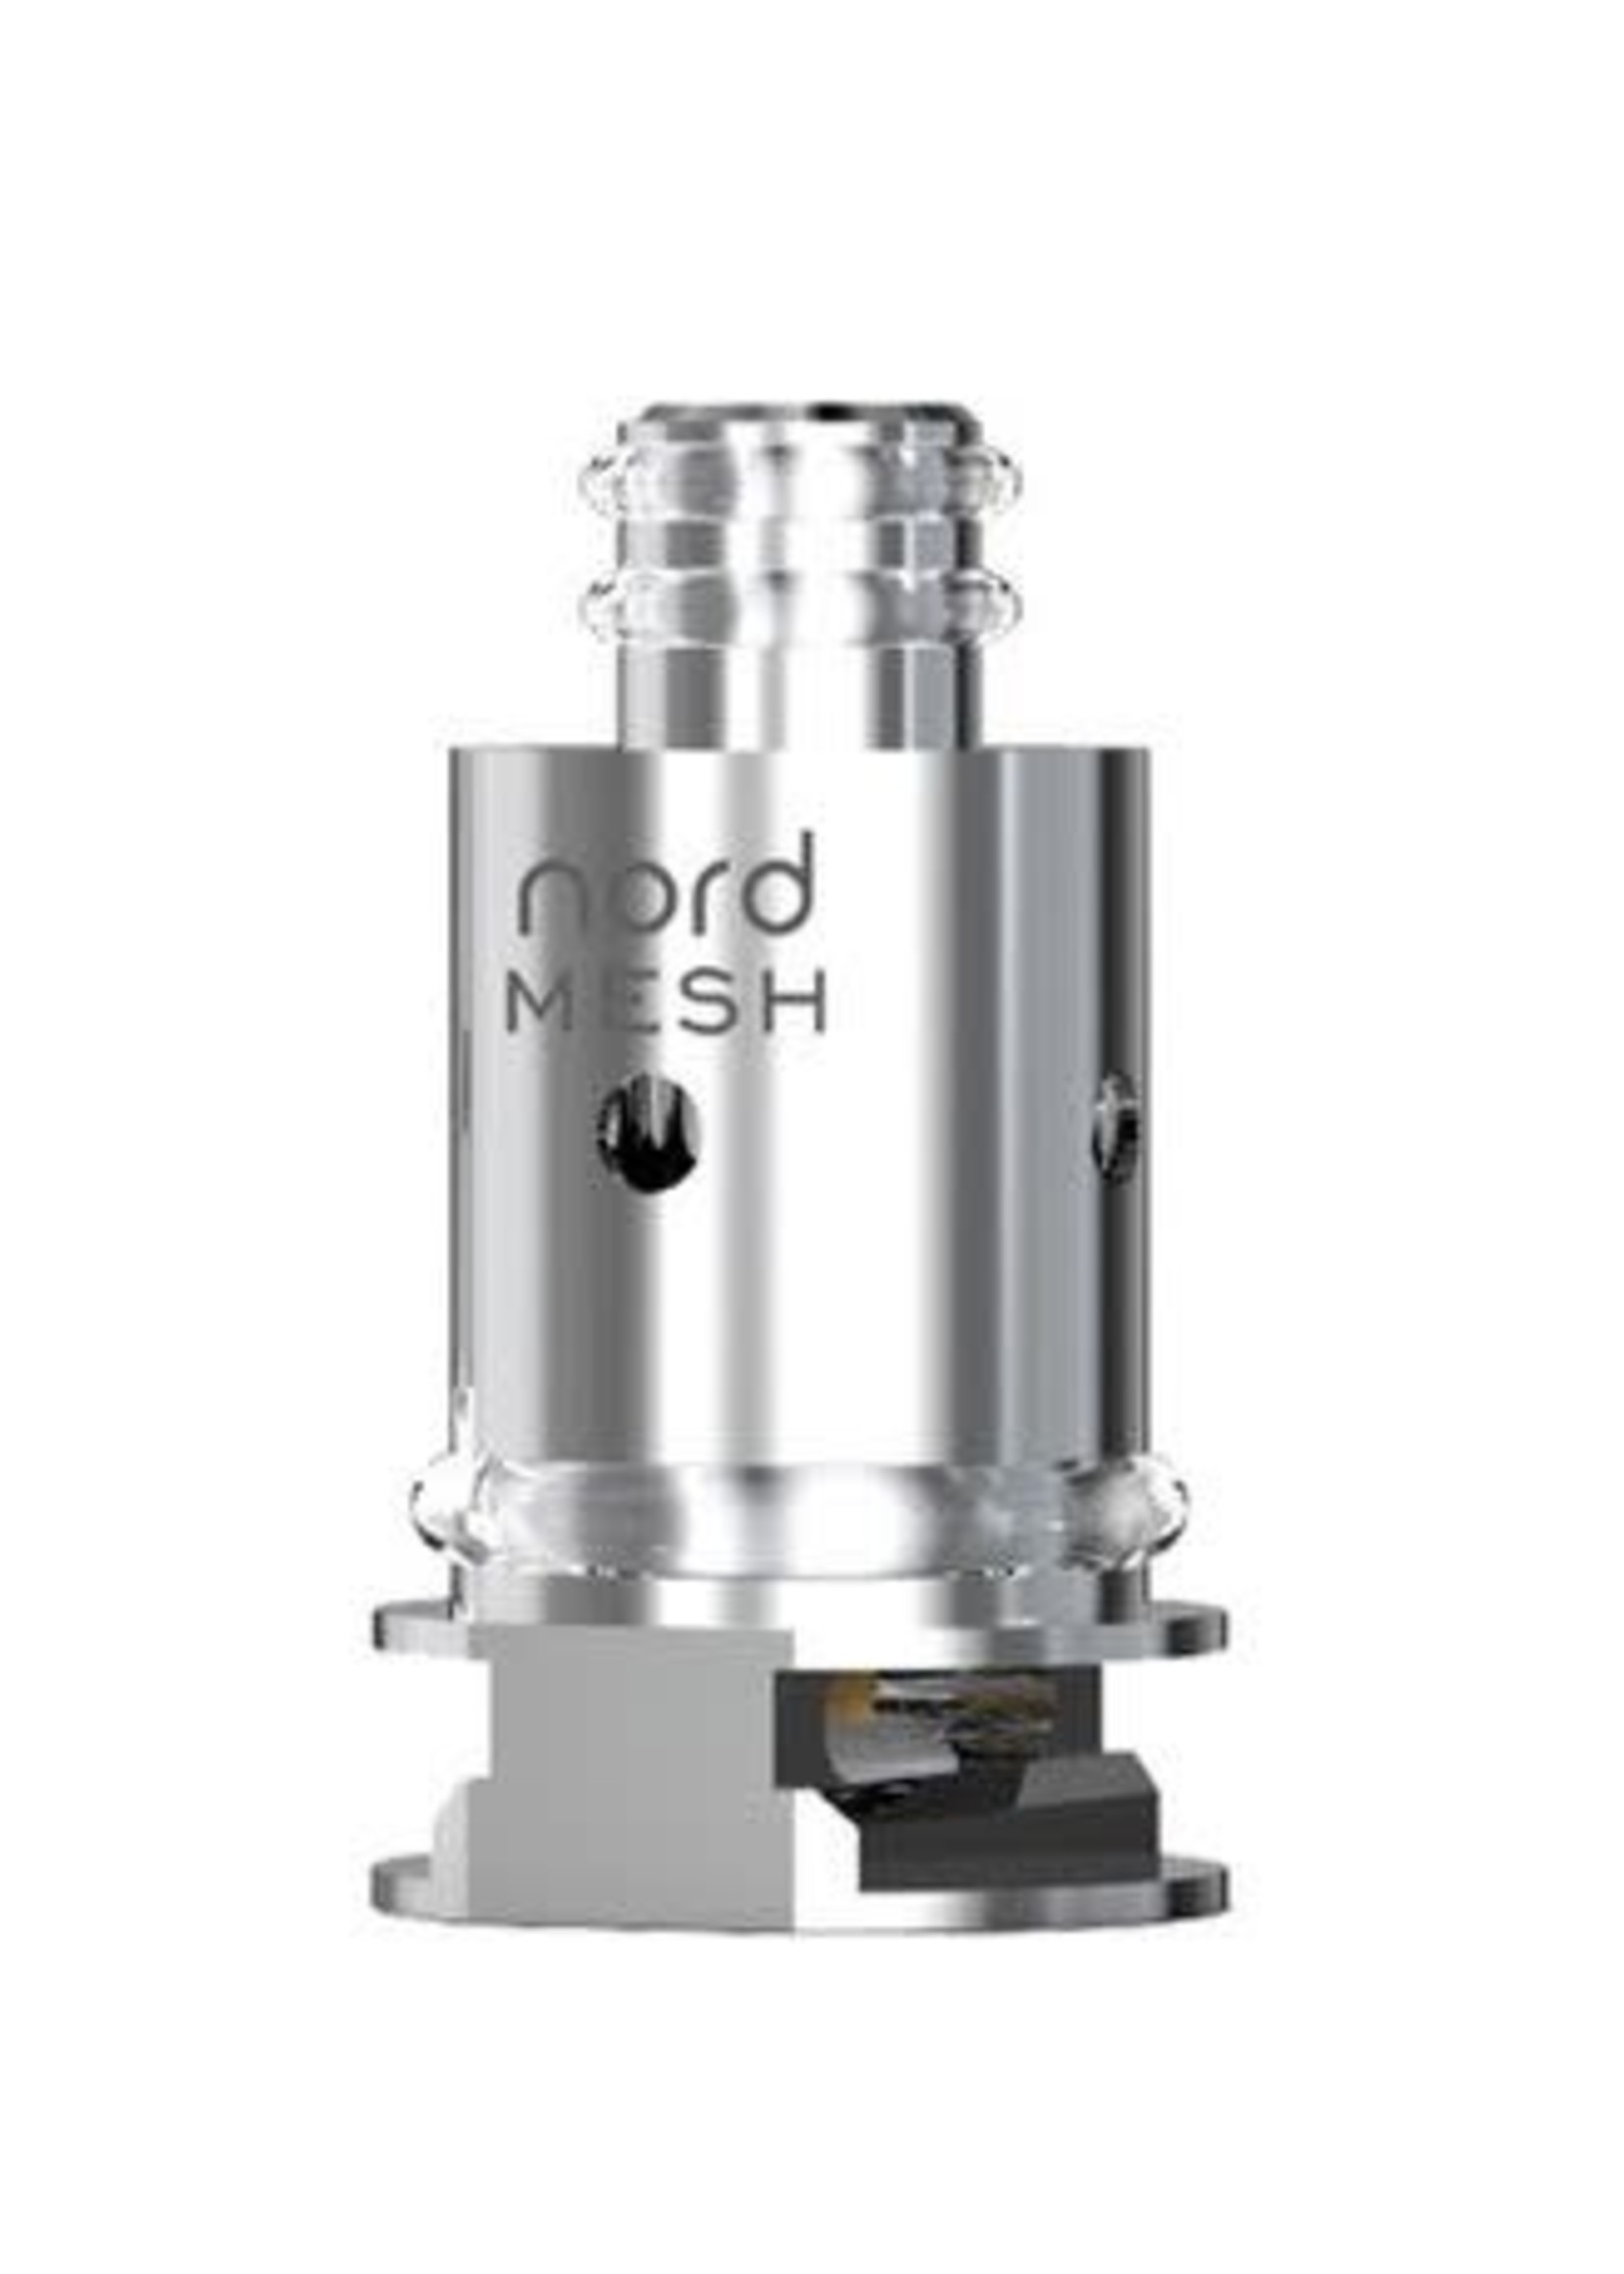 Smok Nord mesh coil - 0.6 ohm